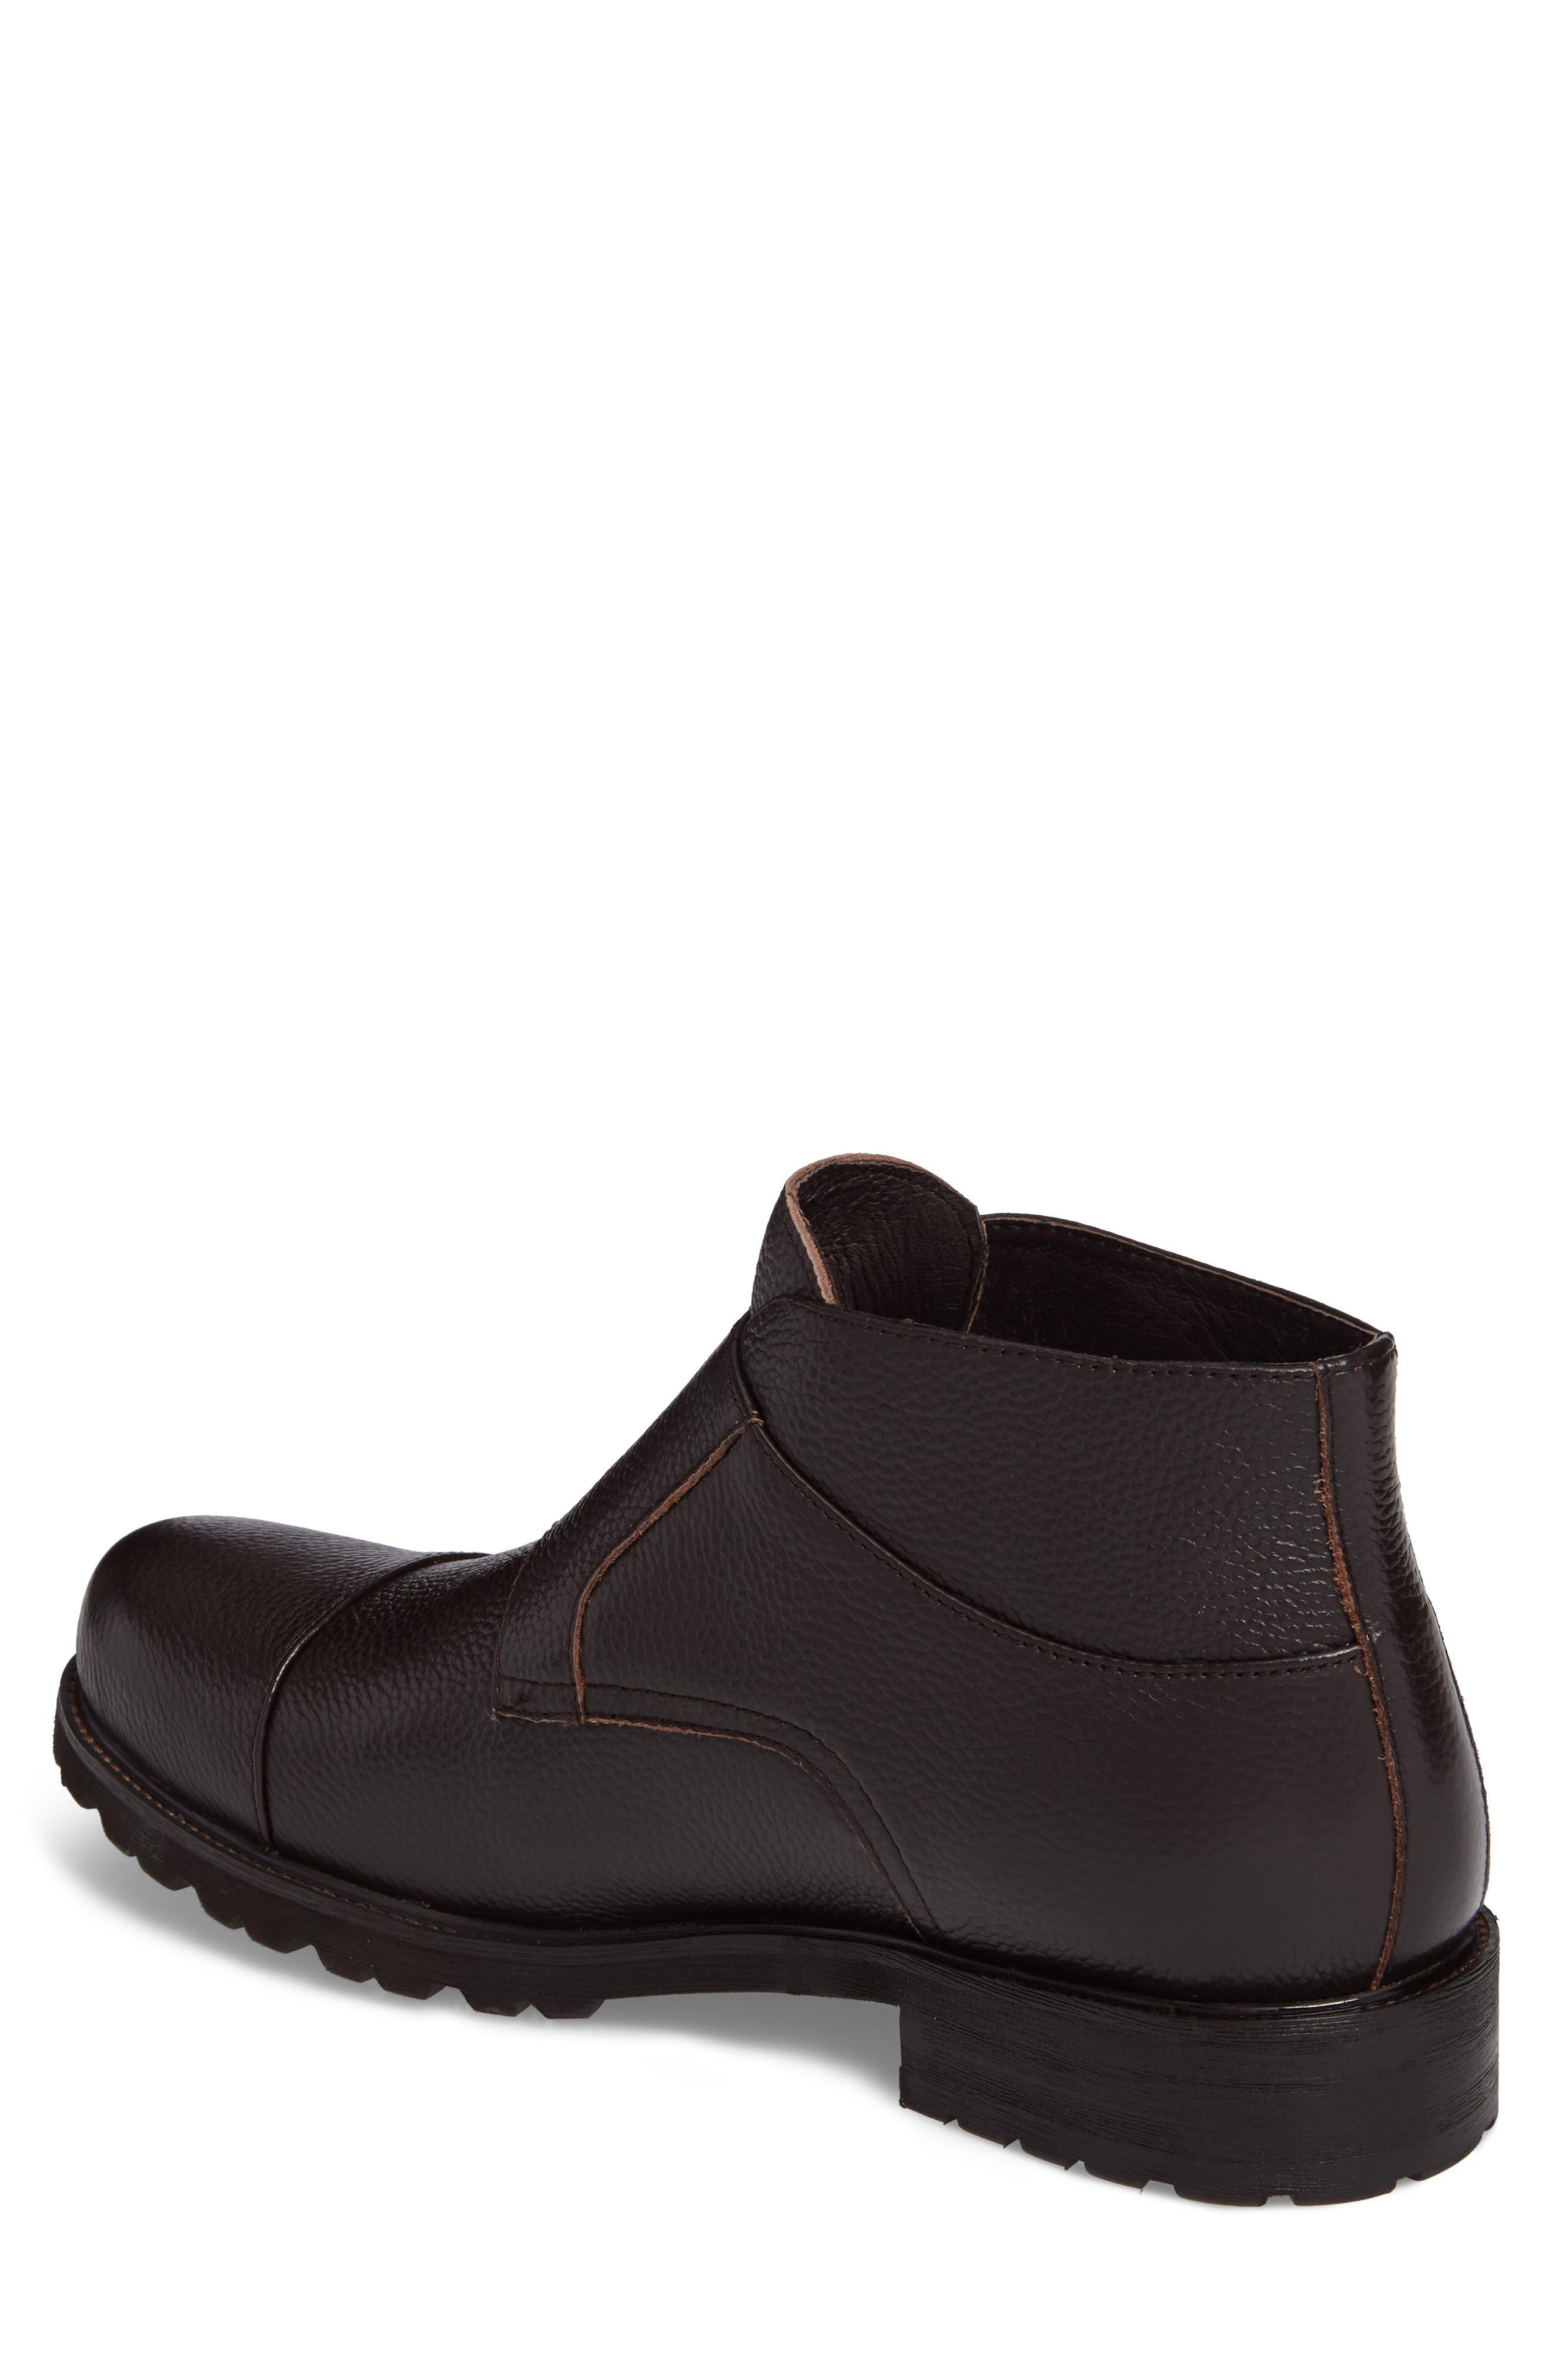 Koller Cap Toe Double Monk Boot,                             Alternate thumbnail 2, color,                             Black Leather